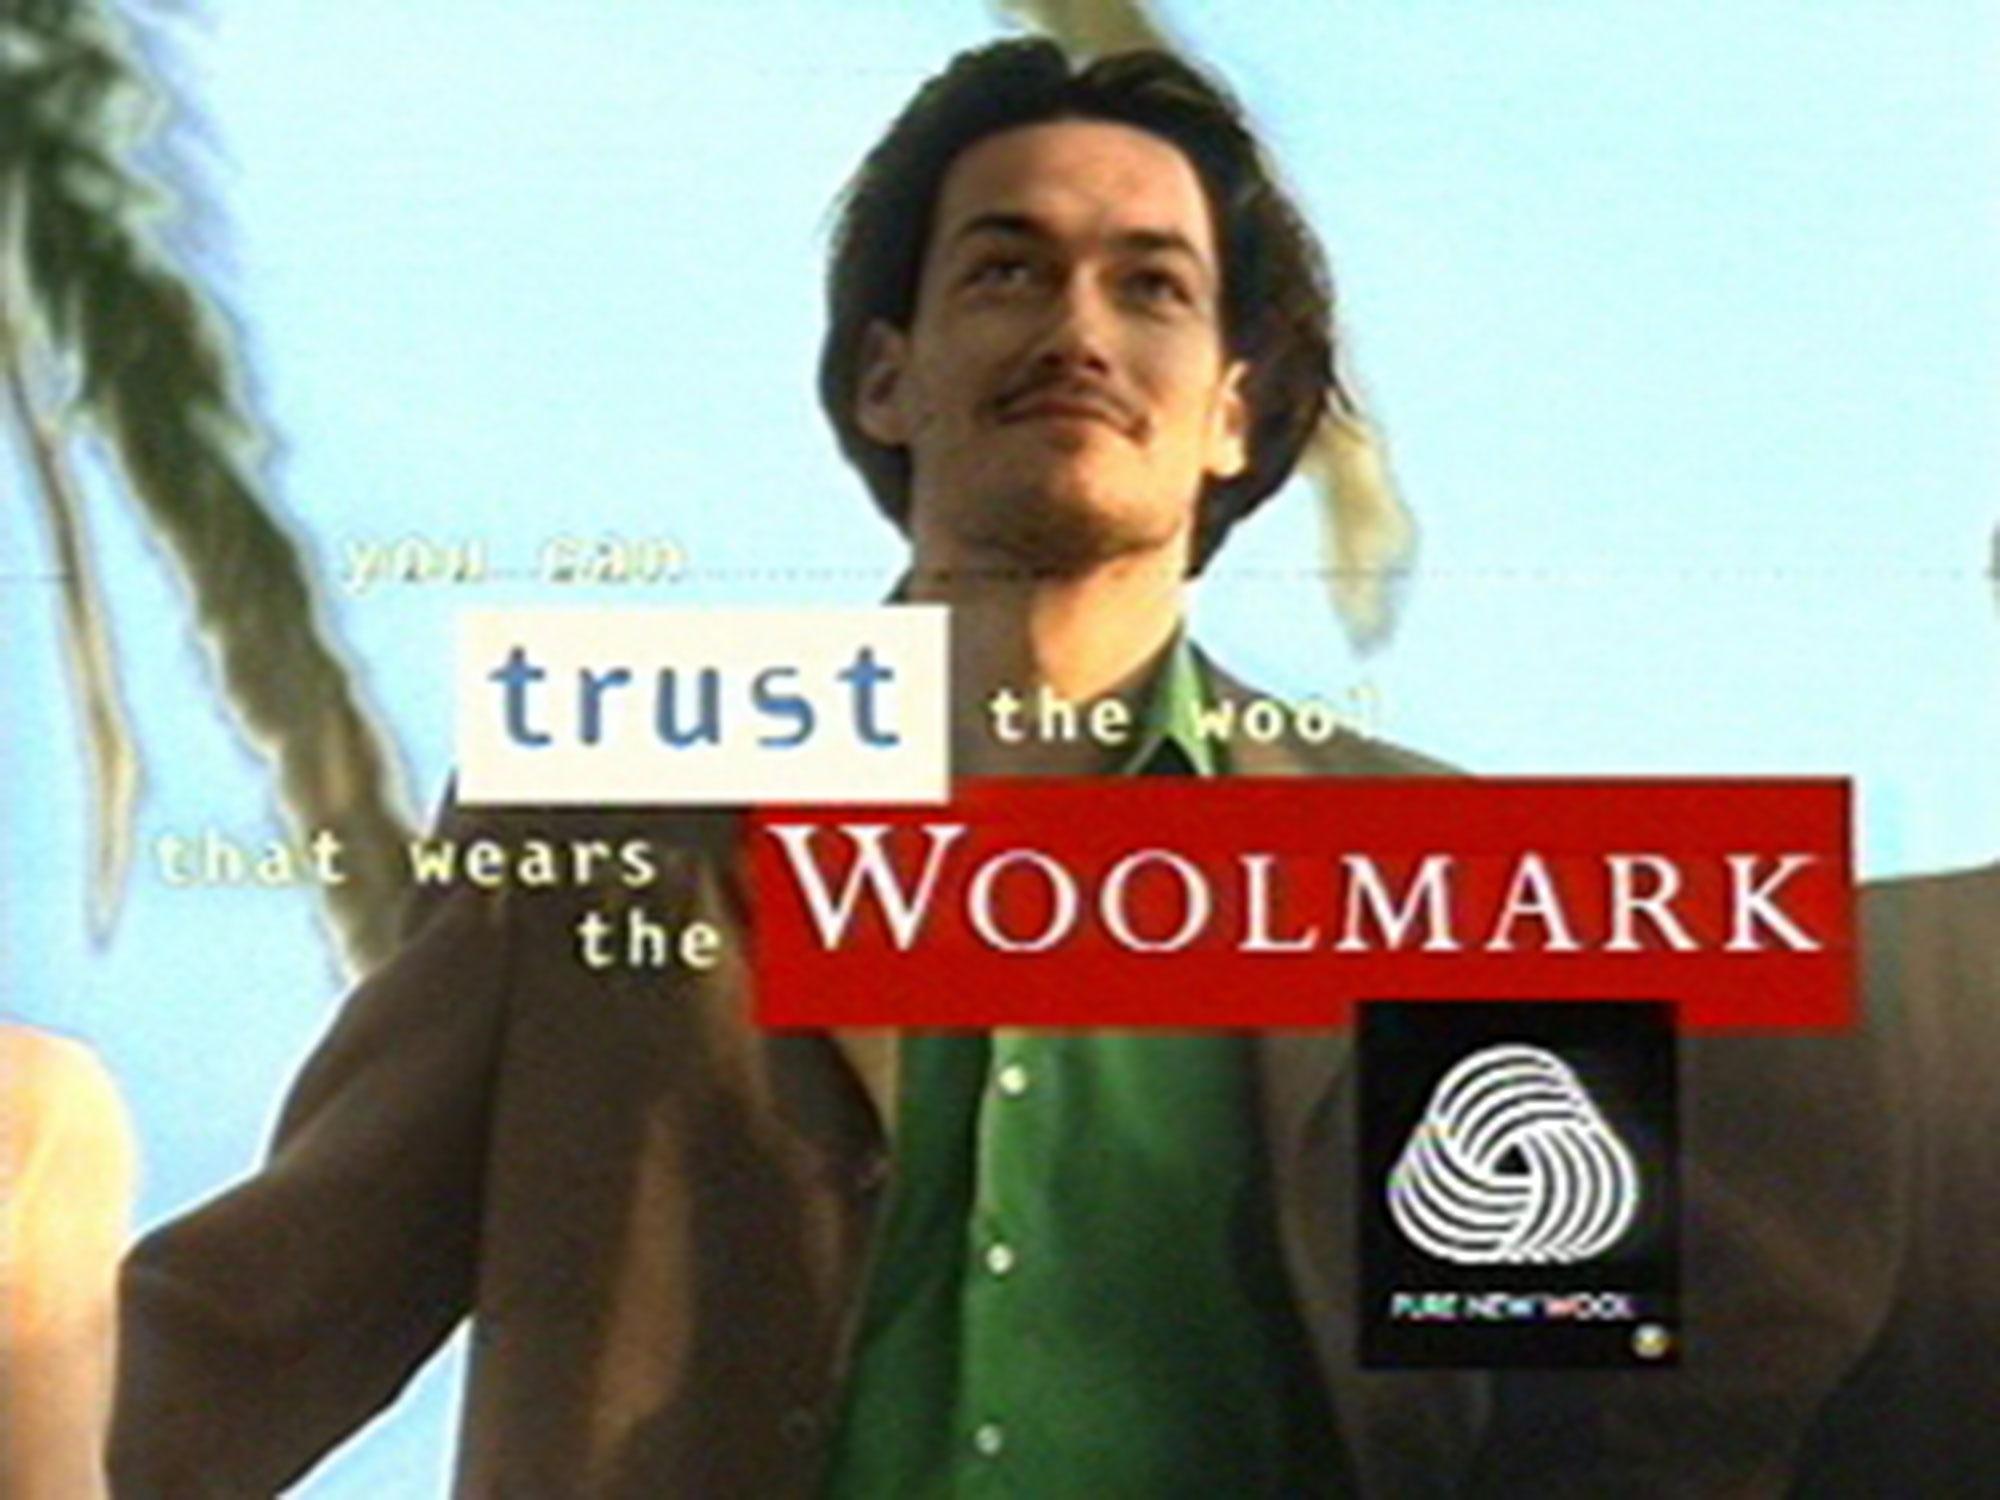 WOOLMARK (International Wool Secretariat) 02